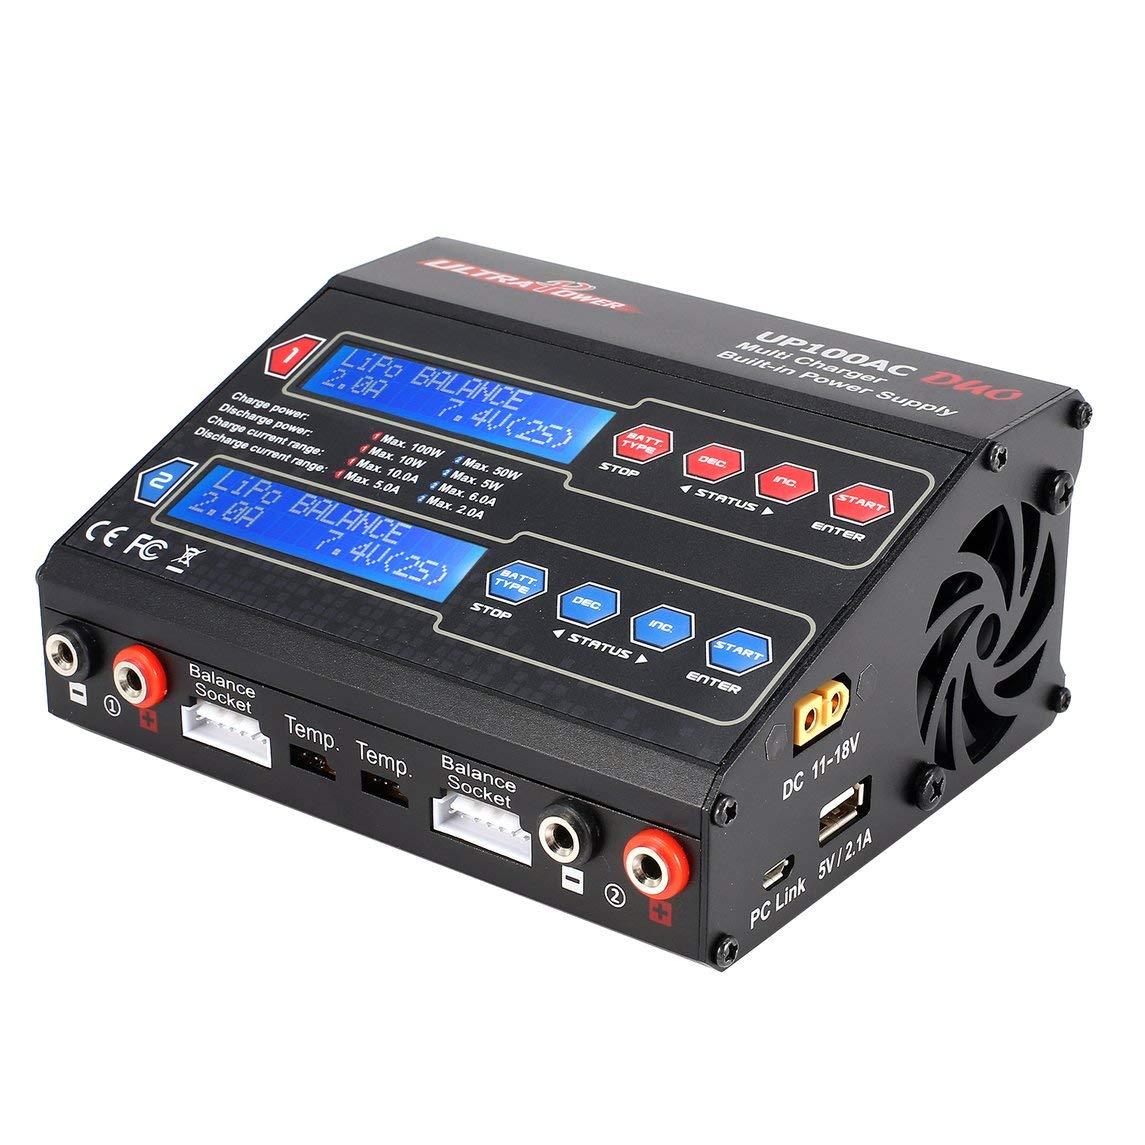 Footprintse Cargador baterias RC;Cargador 7.2v RC Equilibrio Ultra Power UP100AC 100W LiIo/LiPo / Life/NiMH / Nicd Cyclic Color del Cargador: Negro